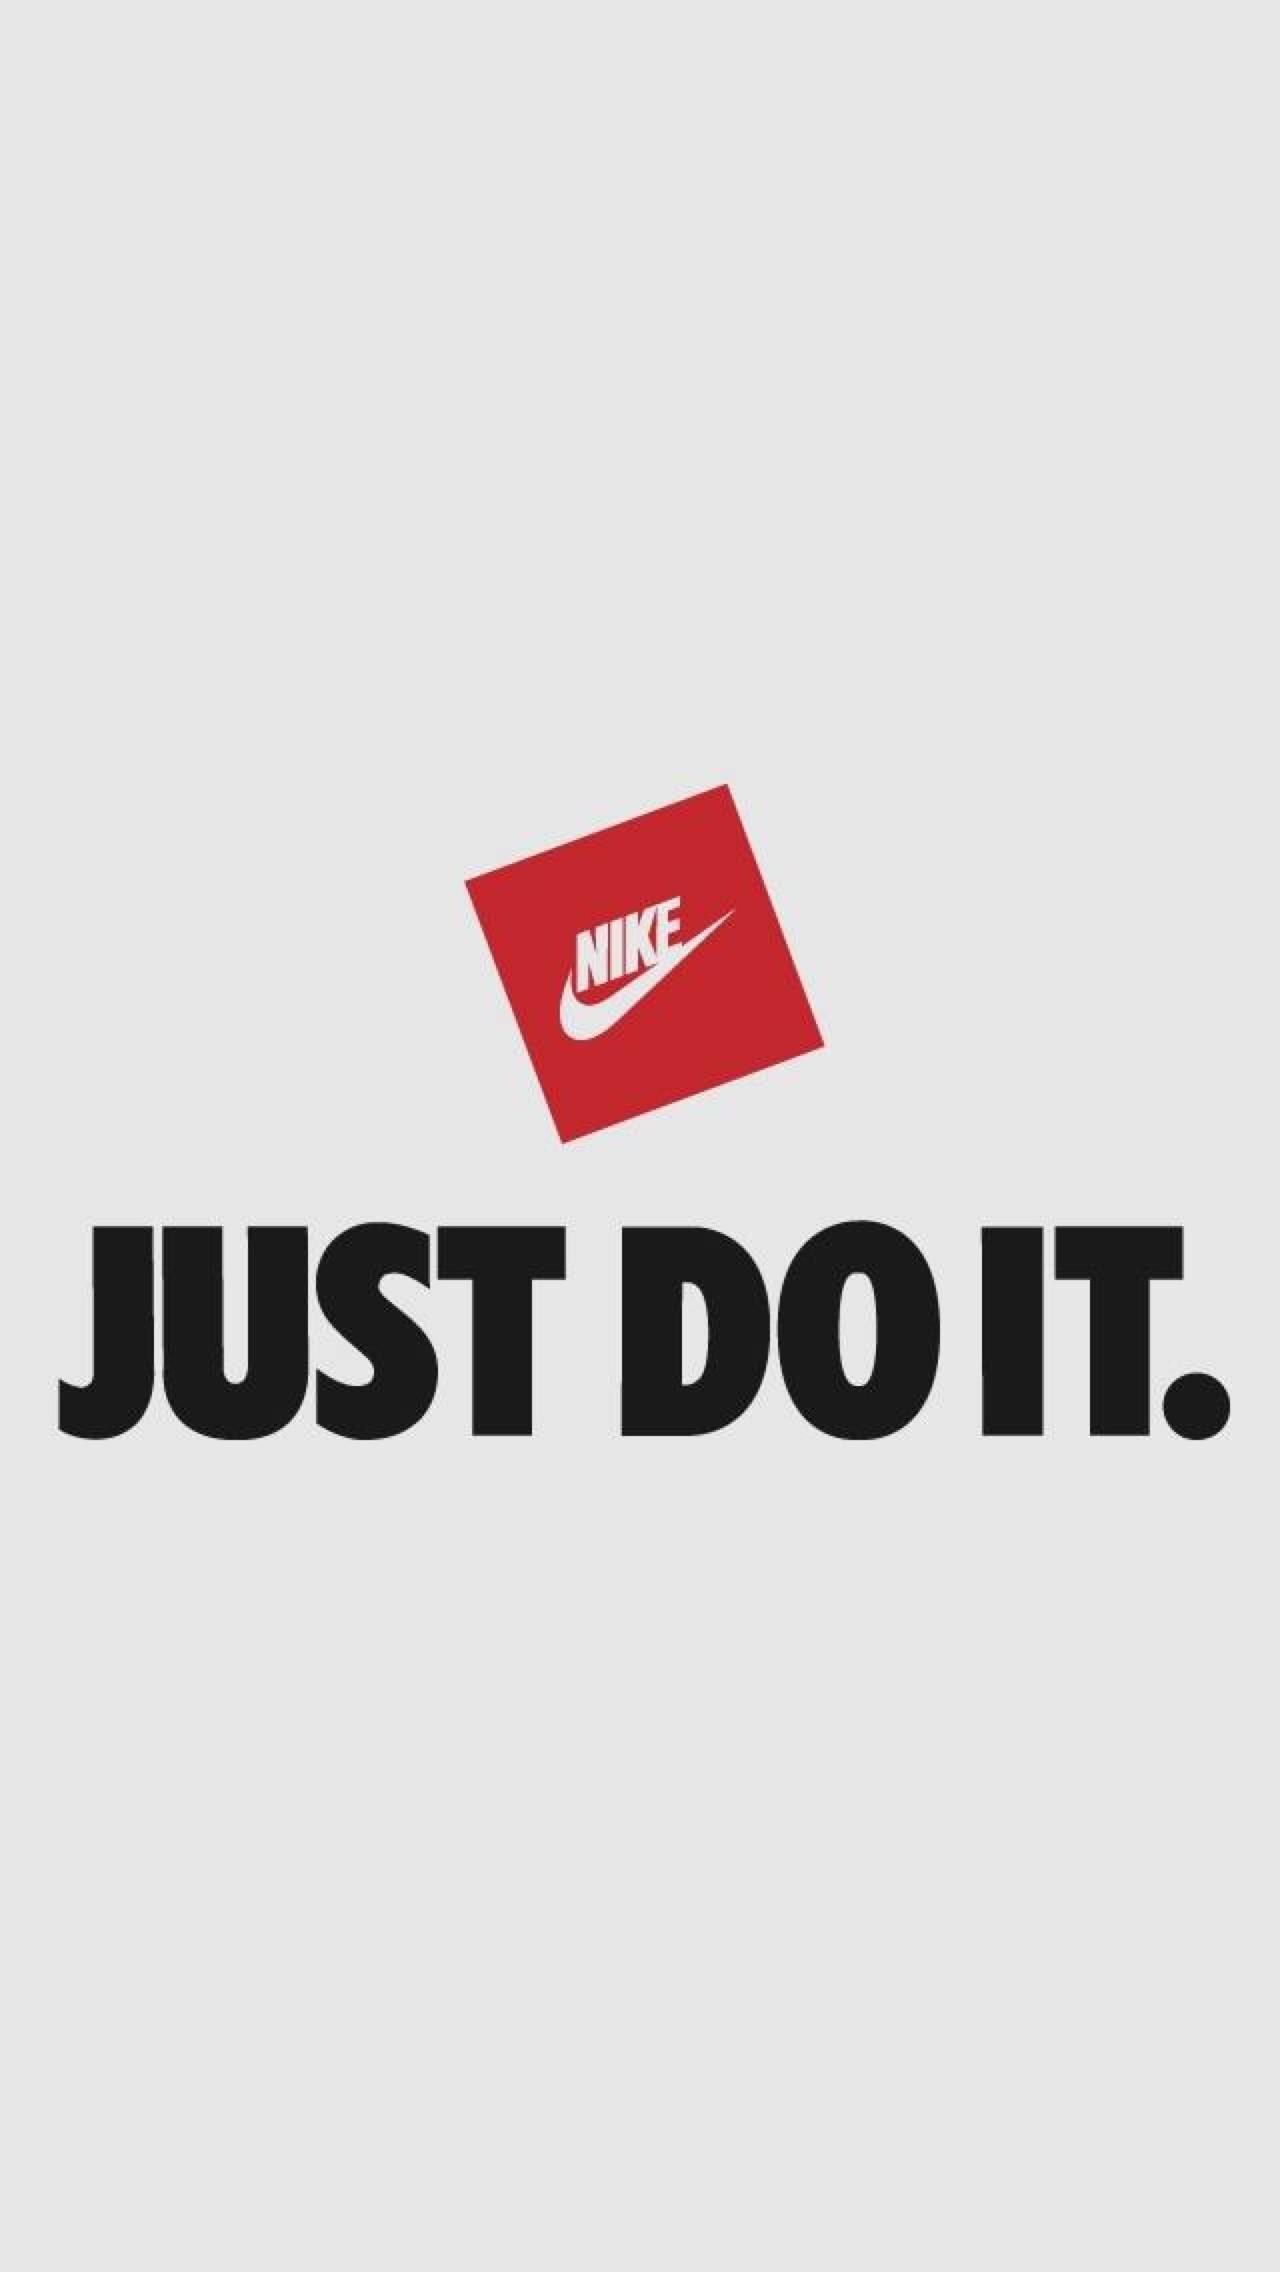 Air Board, Nike Wallpaper, Nike Logo, Phone Wallpapers, Nike Air, Adidas,  Screen, Football, Funds